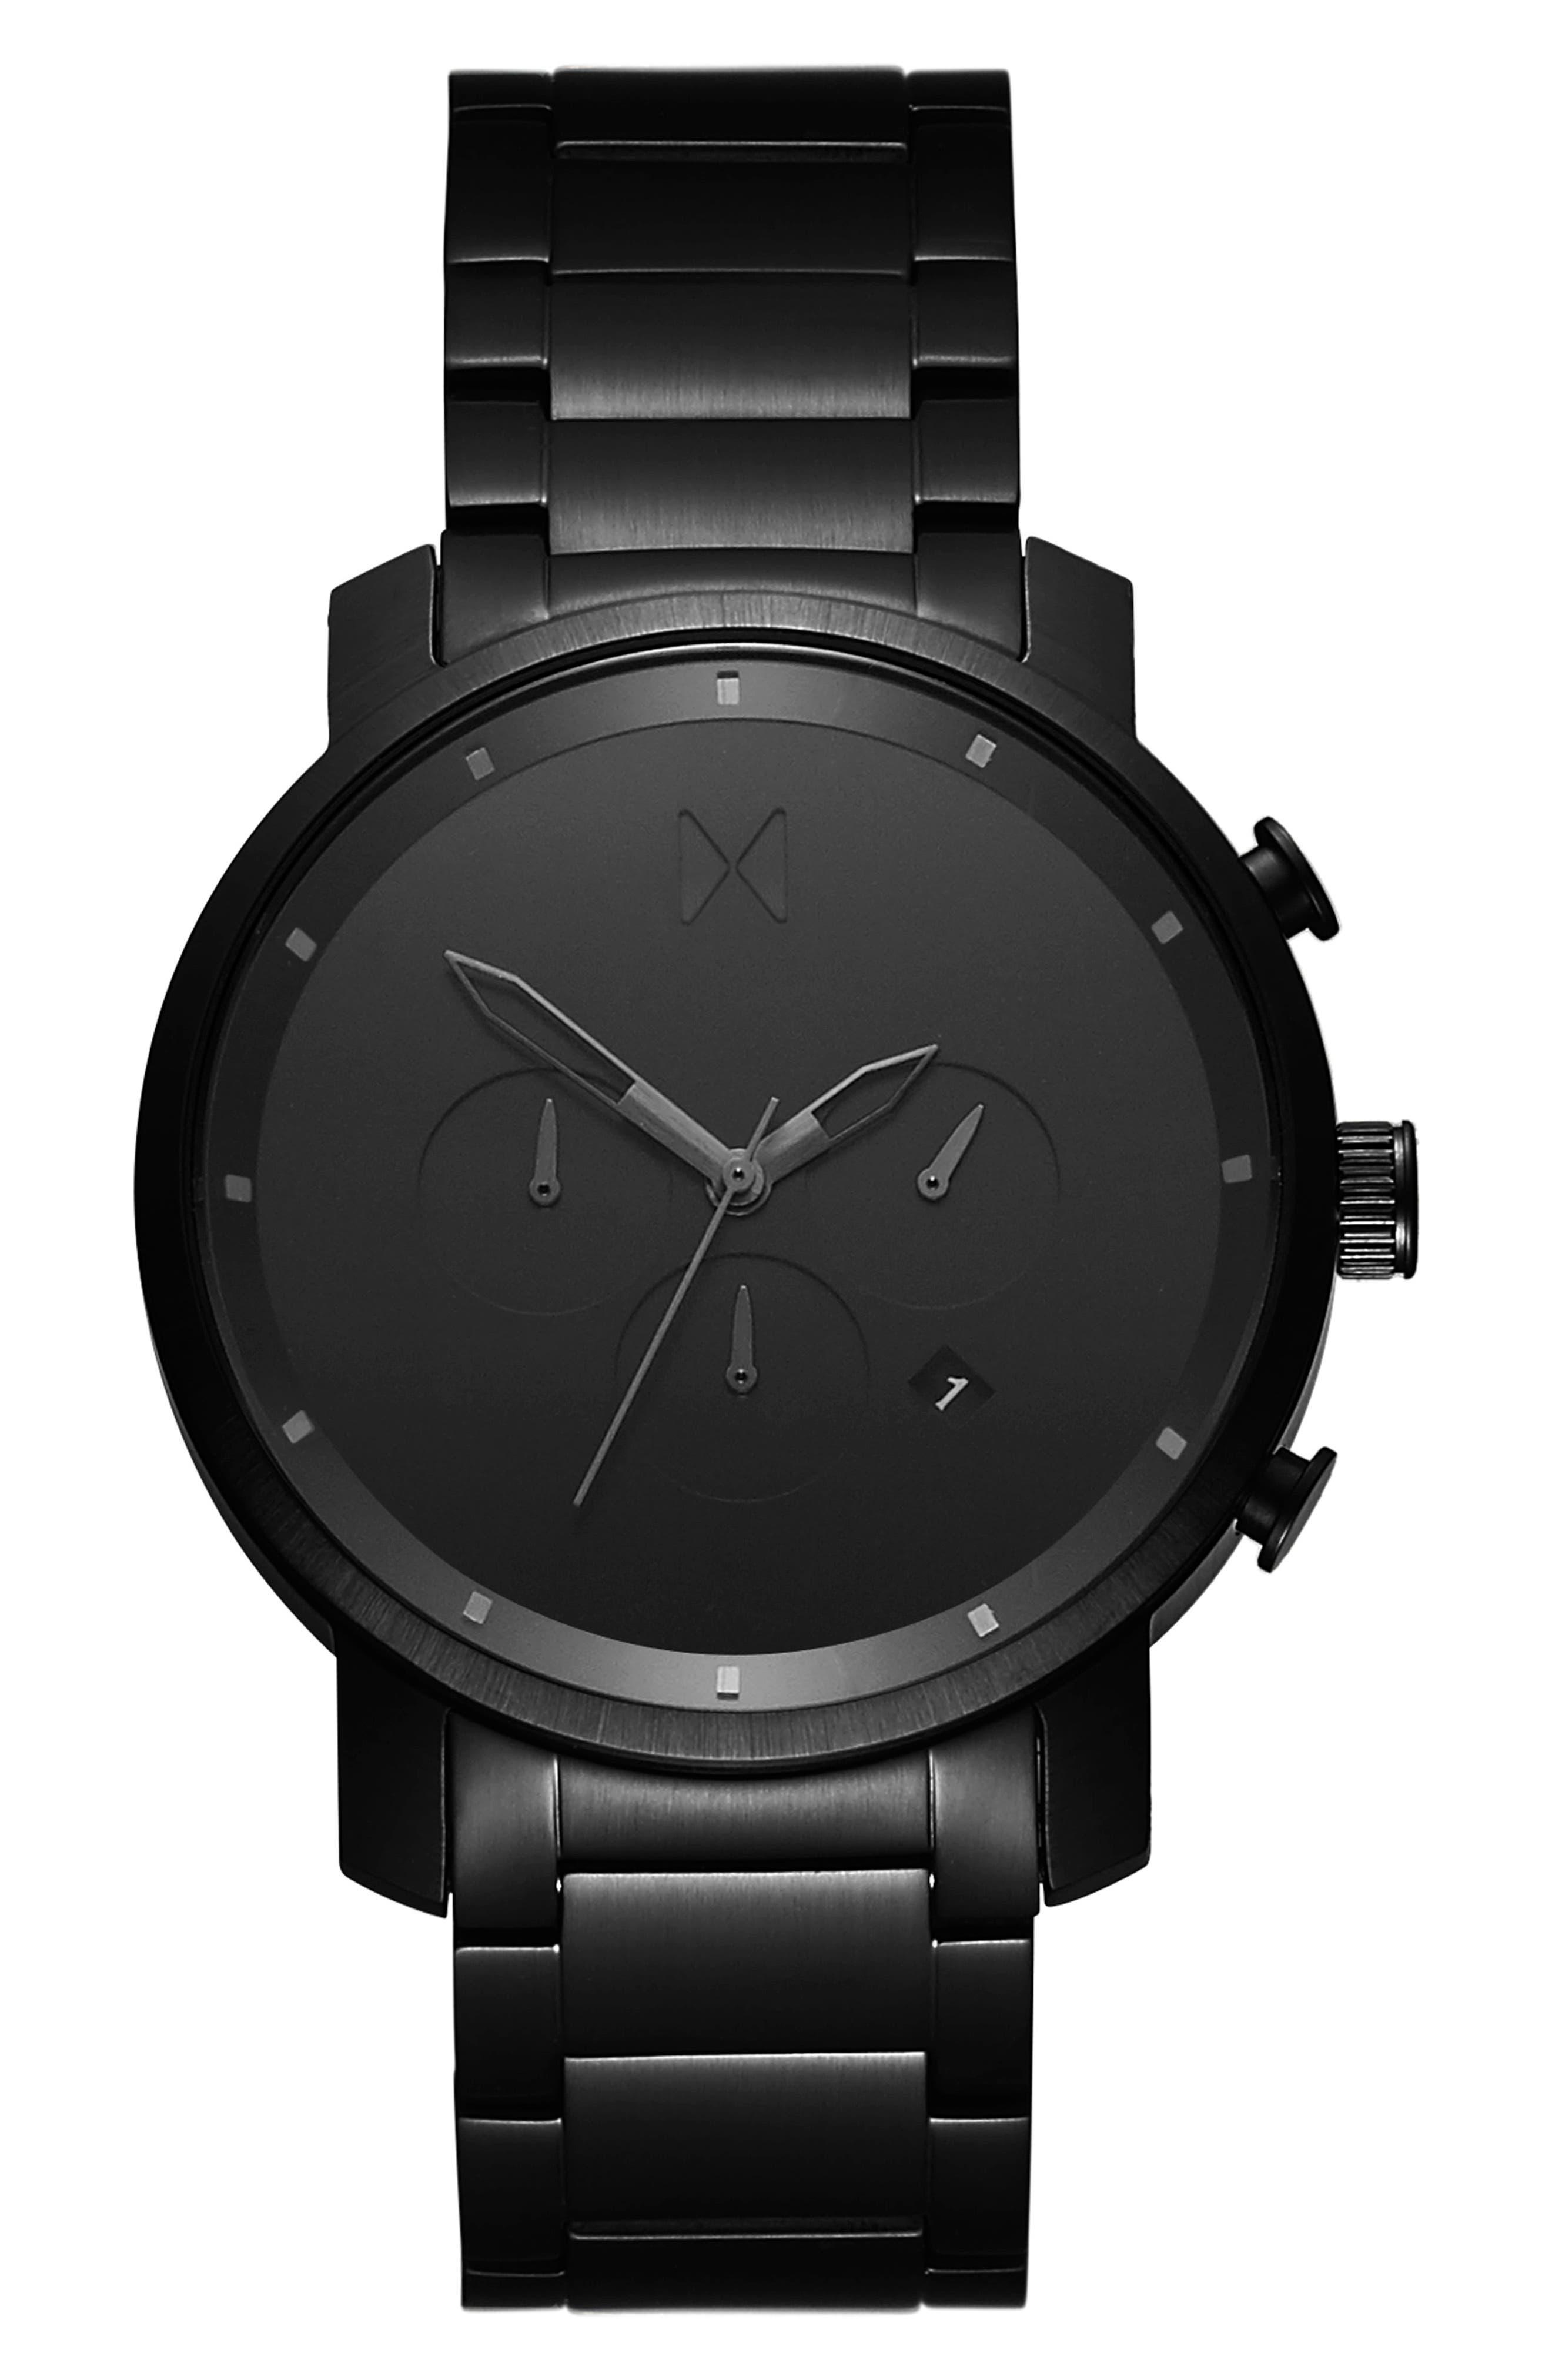 The Chrono Chronograph Bracelet Watch